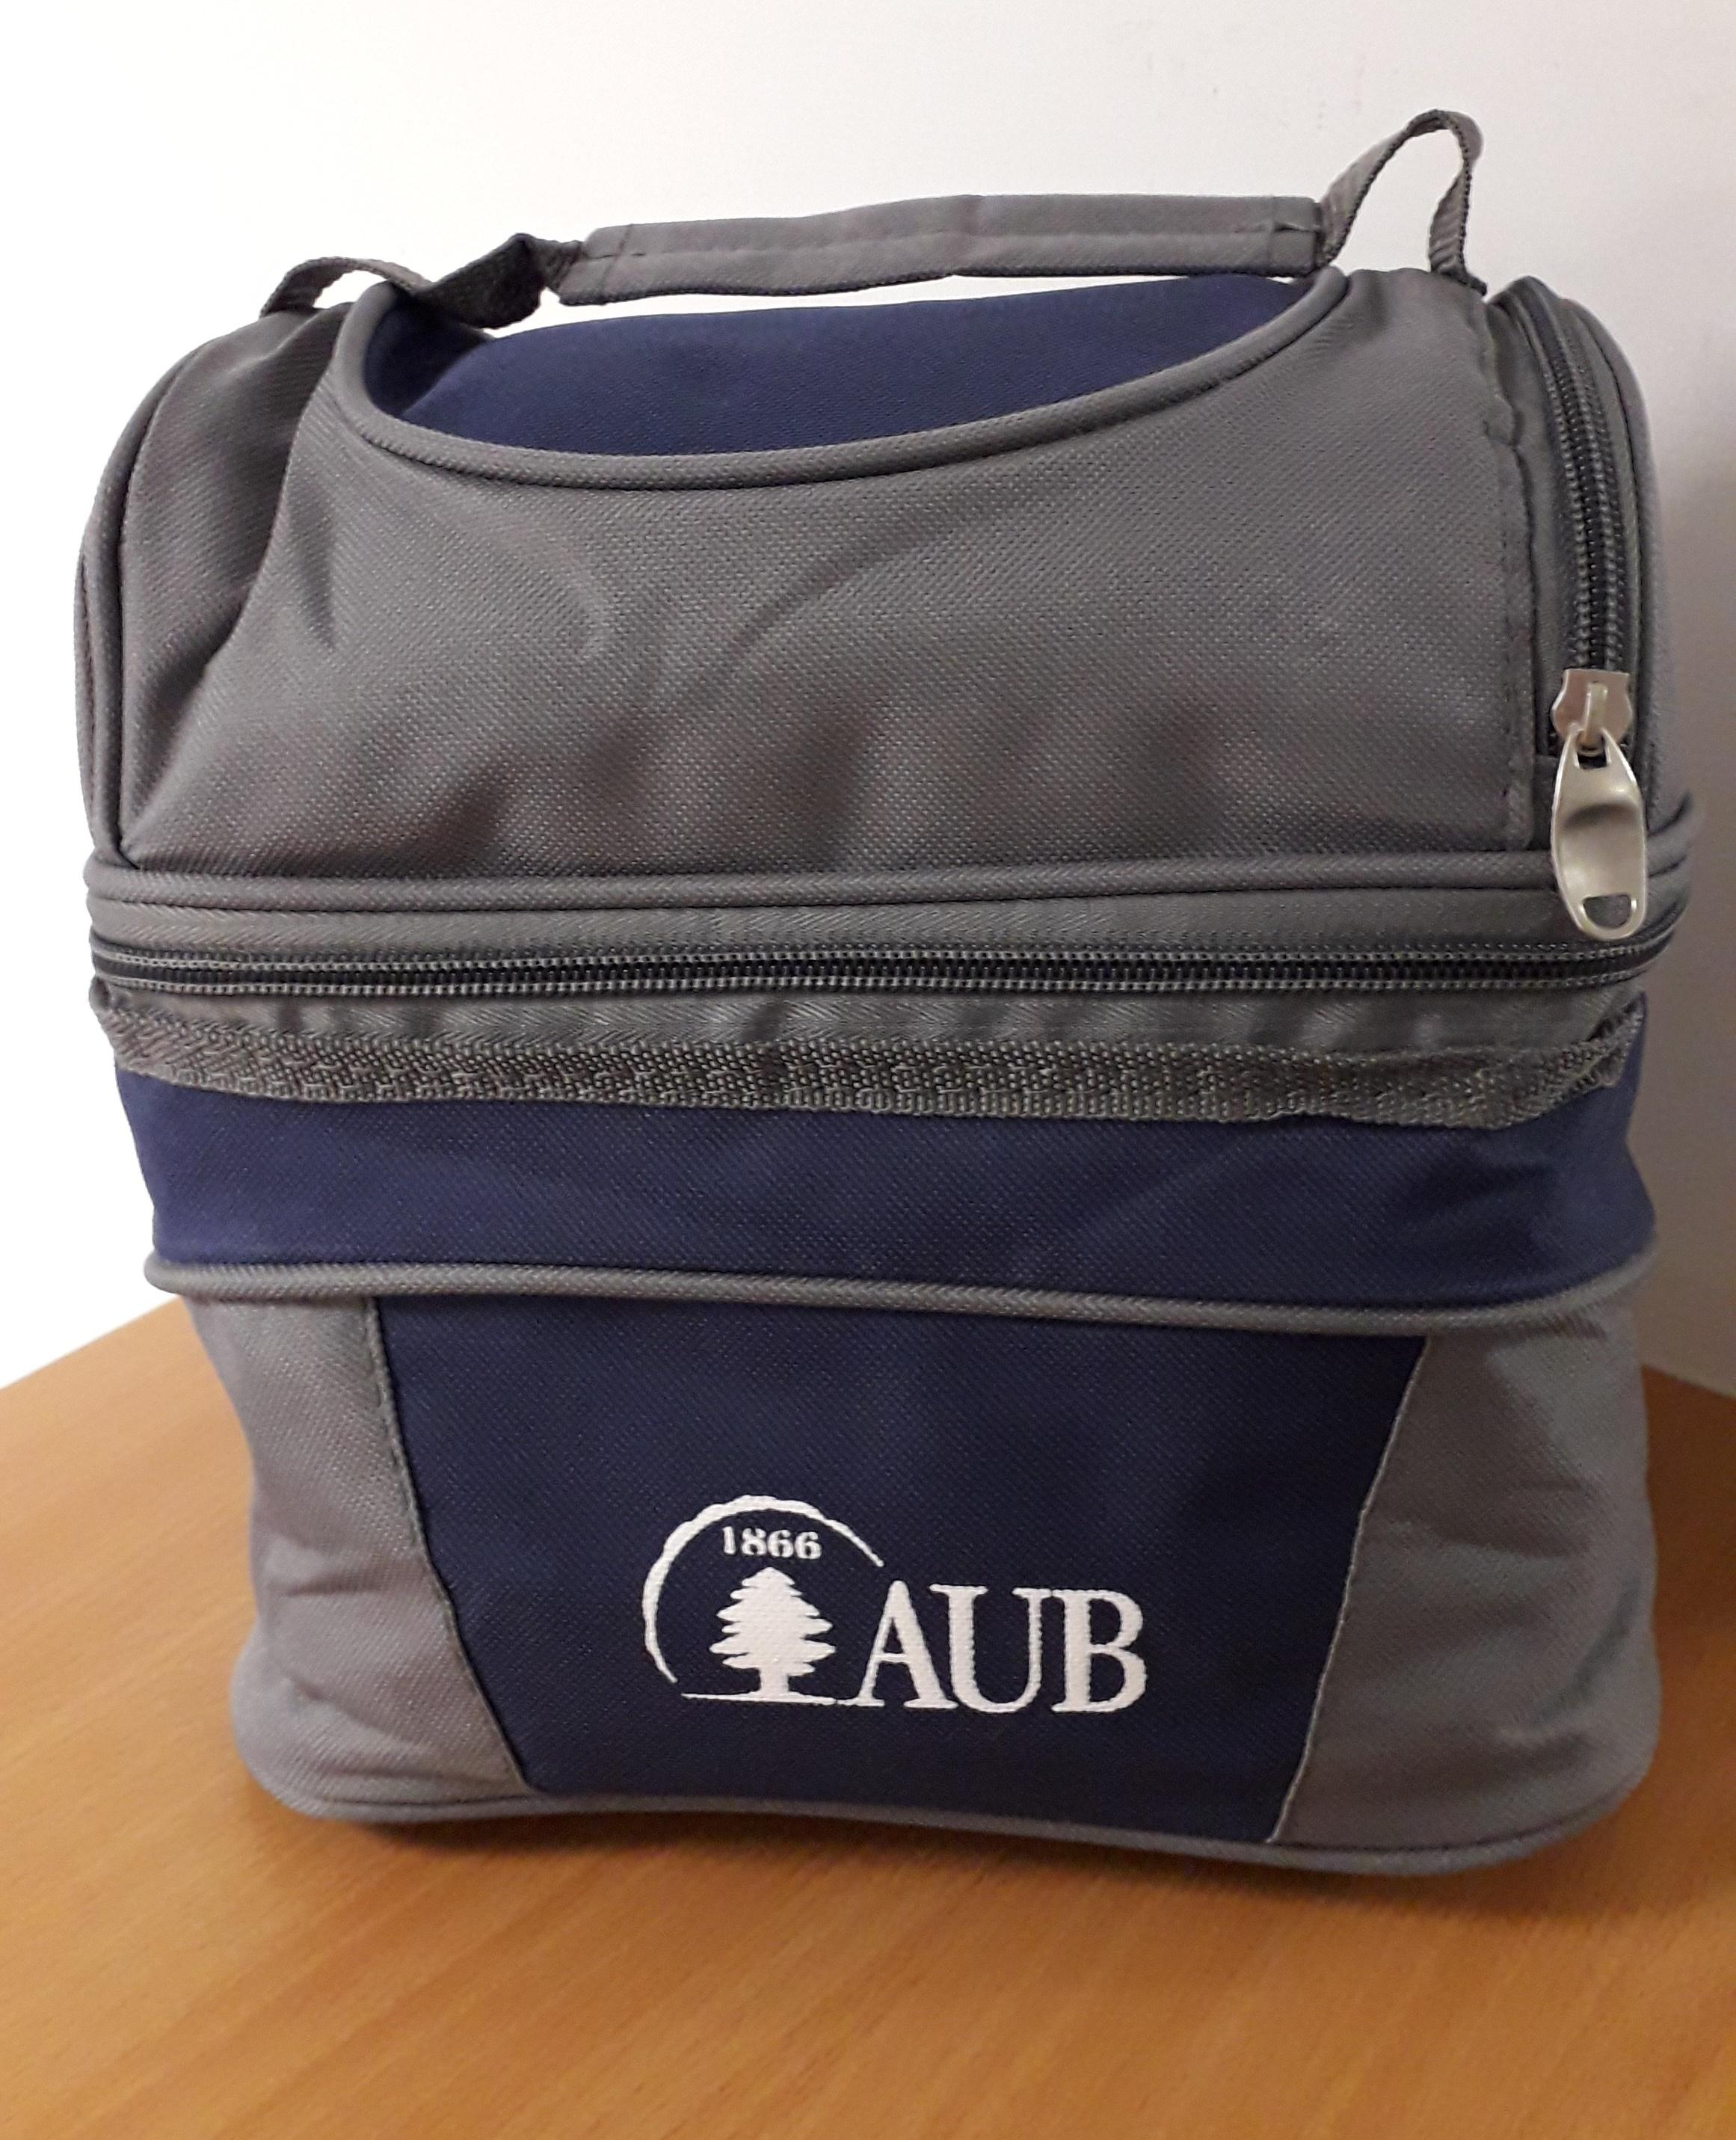 AUB COOLER BAG 2 COMPARTMENTS (L.B/GY, LI/GY, RD/GY, BL/GY)